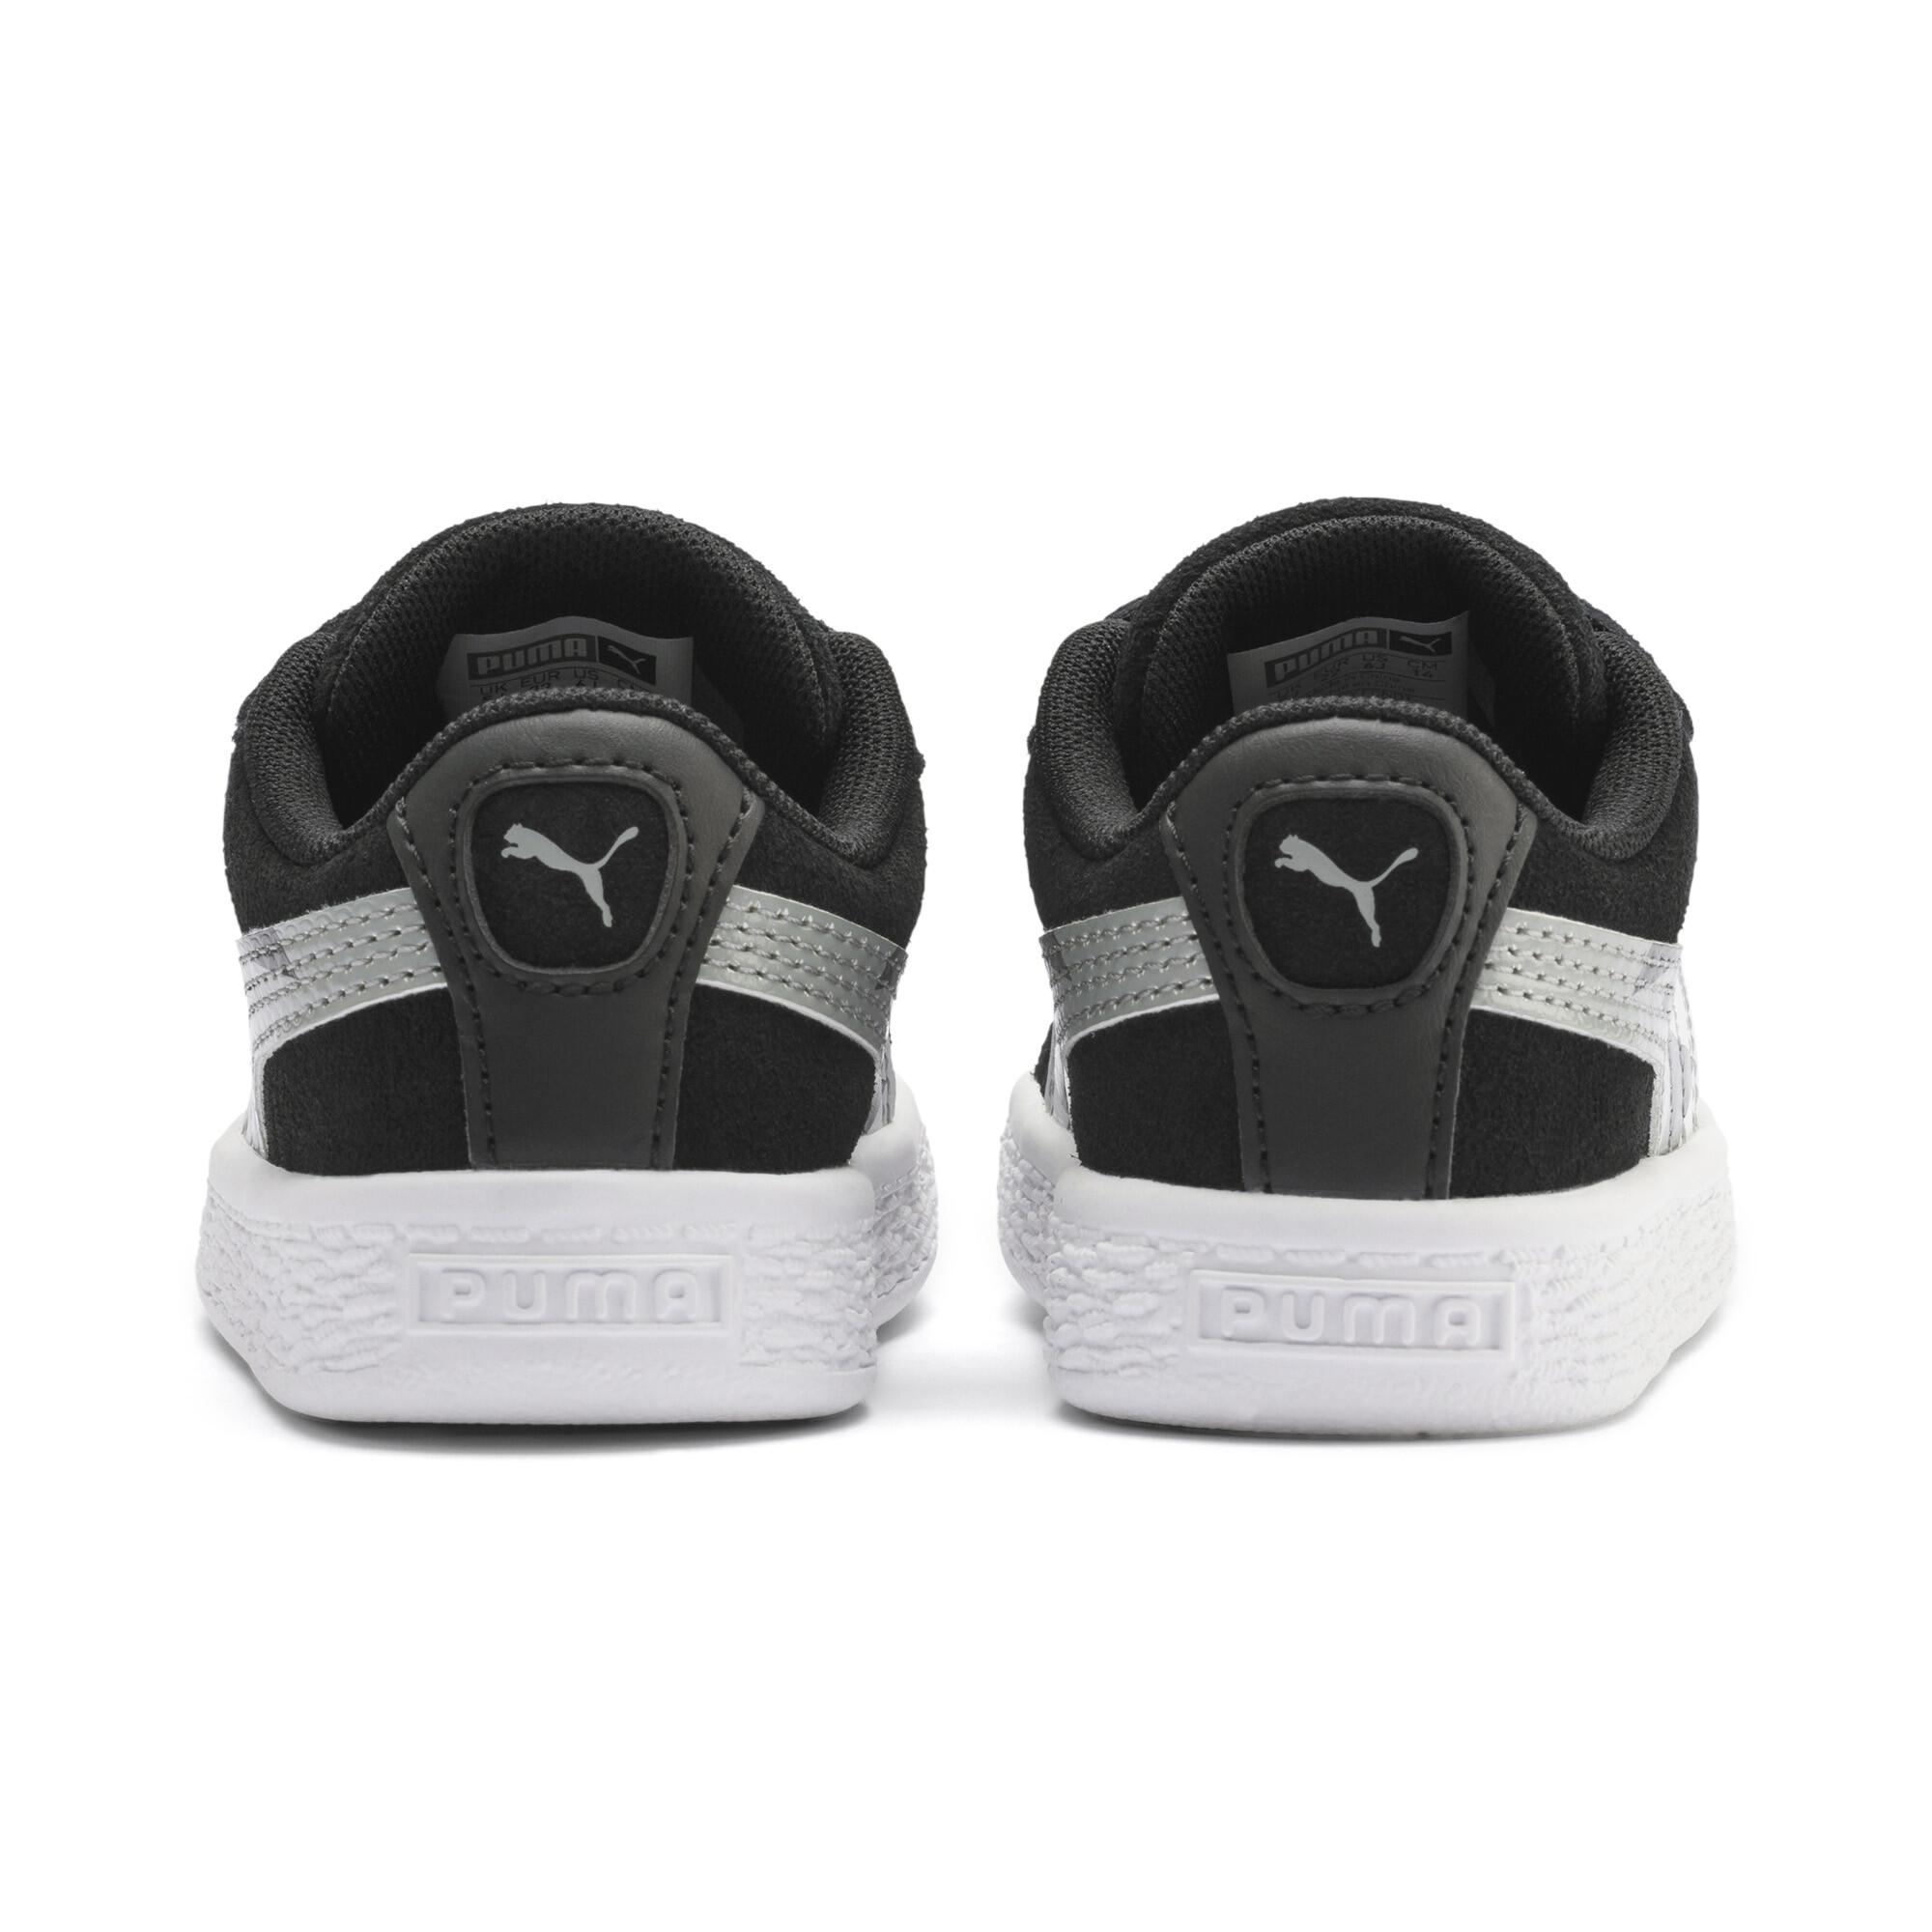 PUMA-Suede-Classic-Lightning-Toddler-Shoes-Boys-Shoe-Kids thumbnail 3